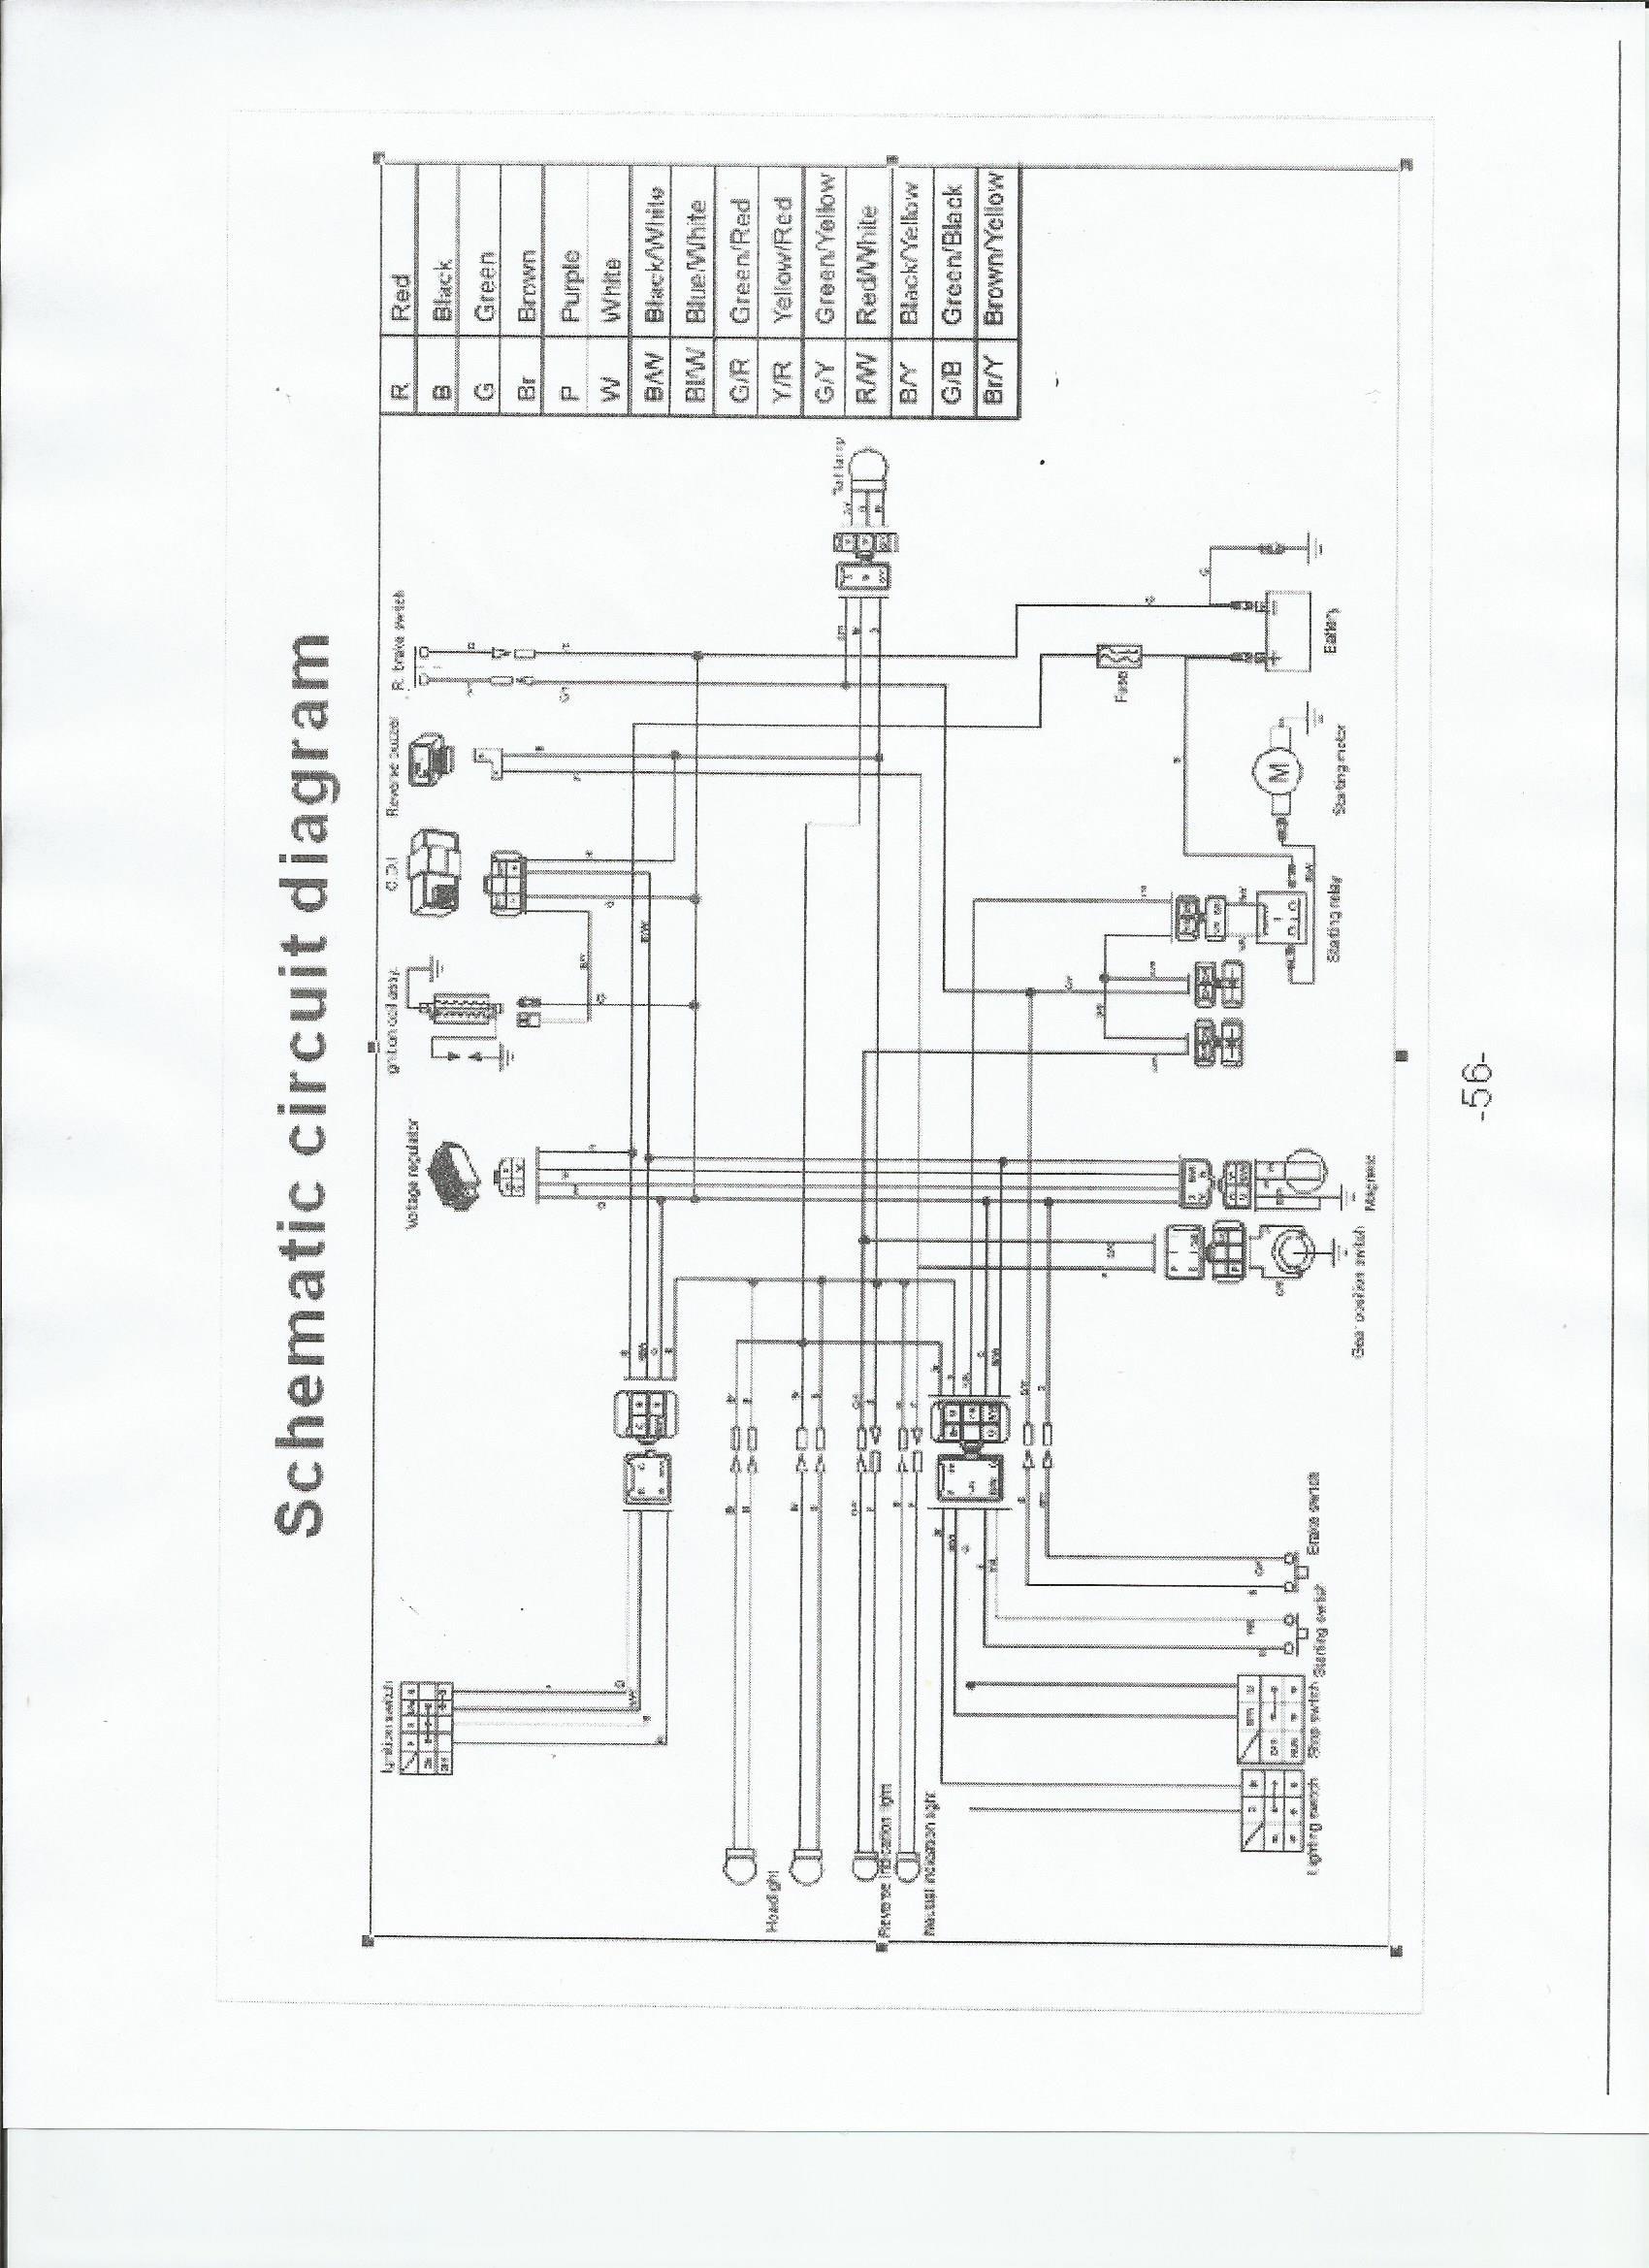 Tao Tao 110 4 Wheeler Wiring Harness Free Download \u2022 Oasis Dl Co Tao  Tao 125 ATV Wiring Diagram Tao Tao 110 Starter Wiring Diagram